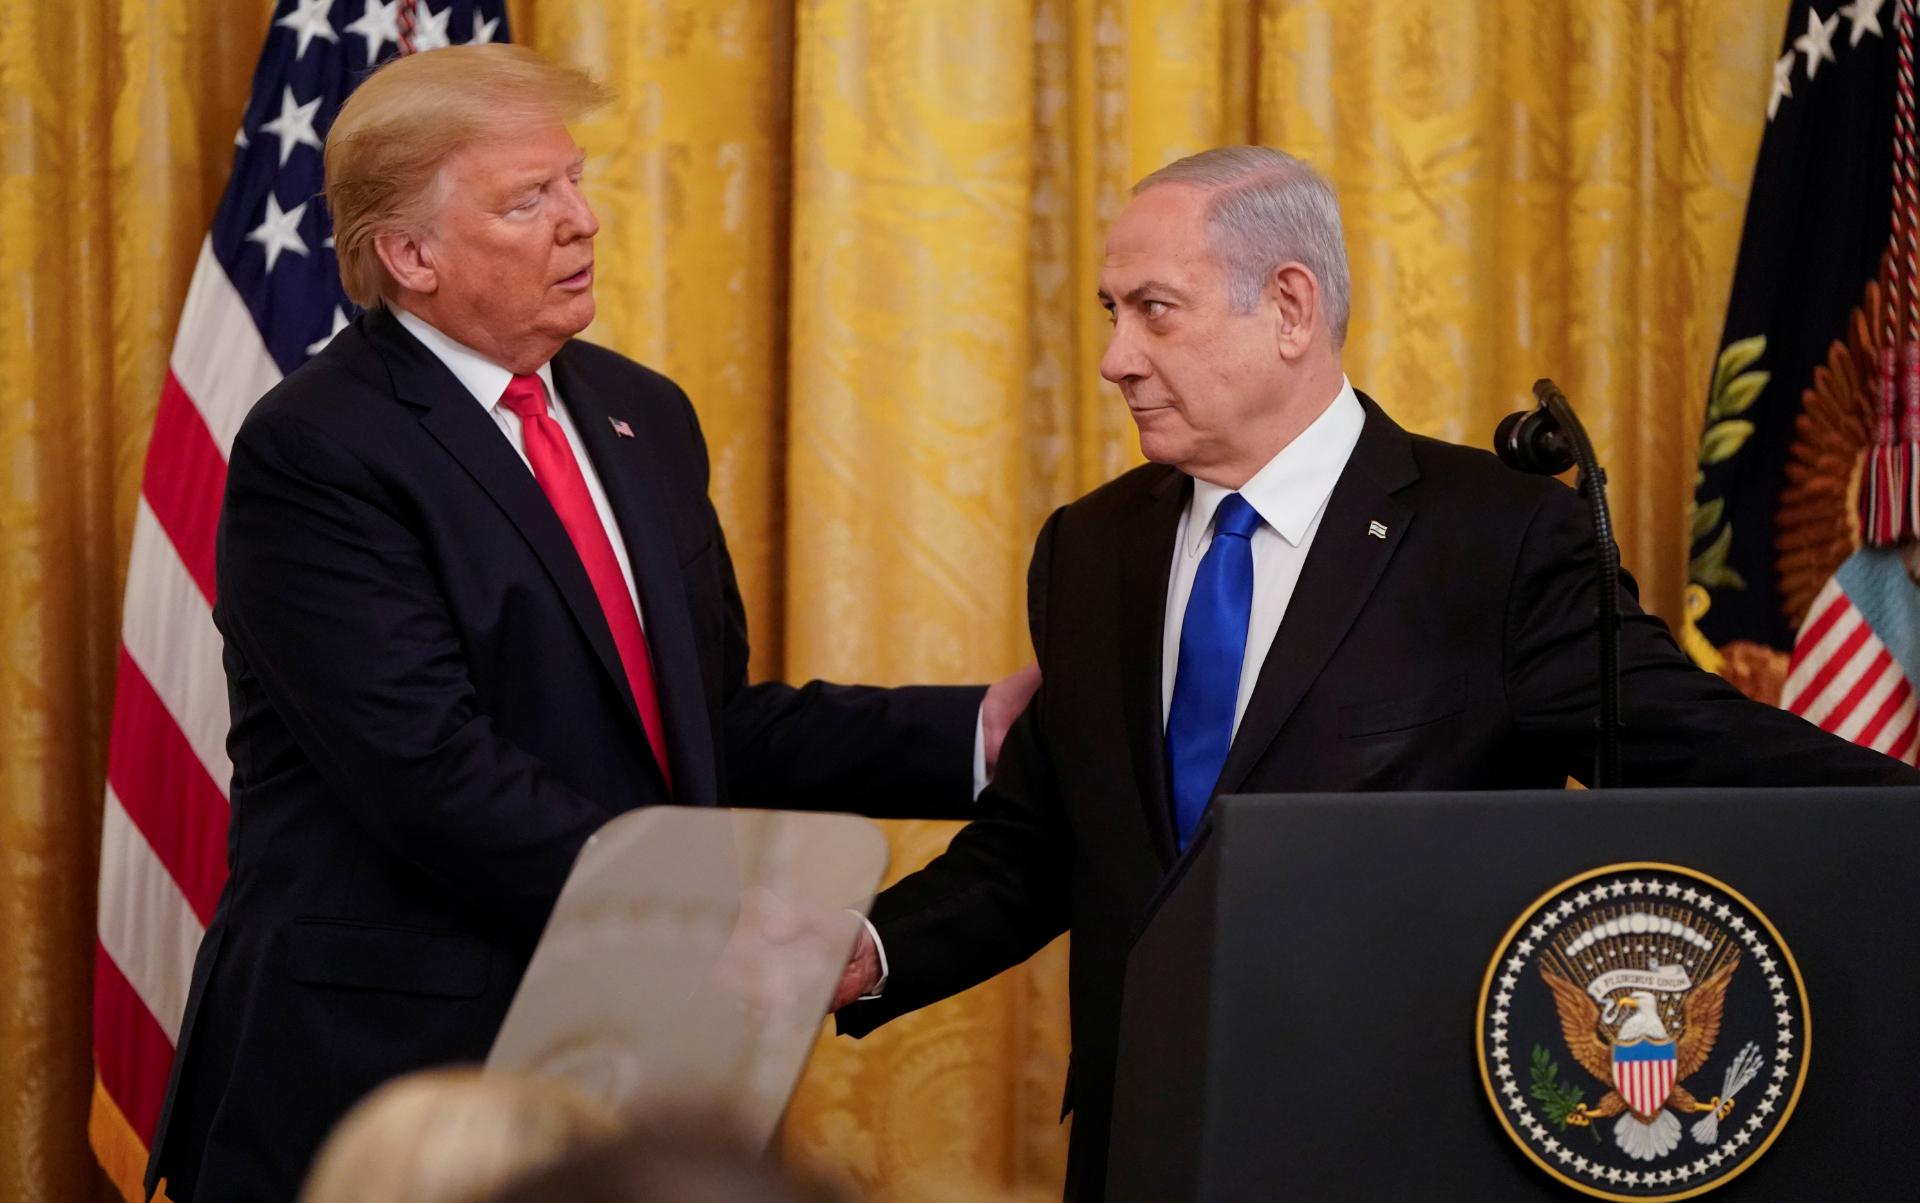 Trump cumprimenta Netanyahu durante entrevista coletiva na Casa Branca